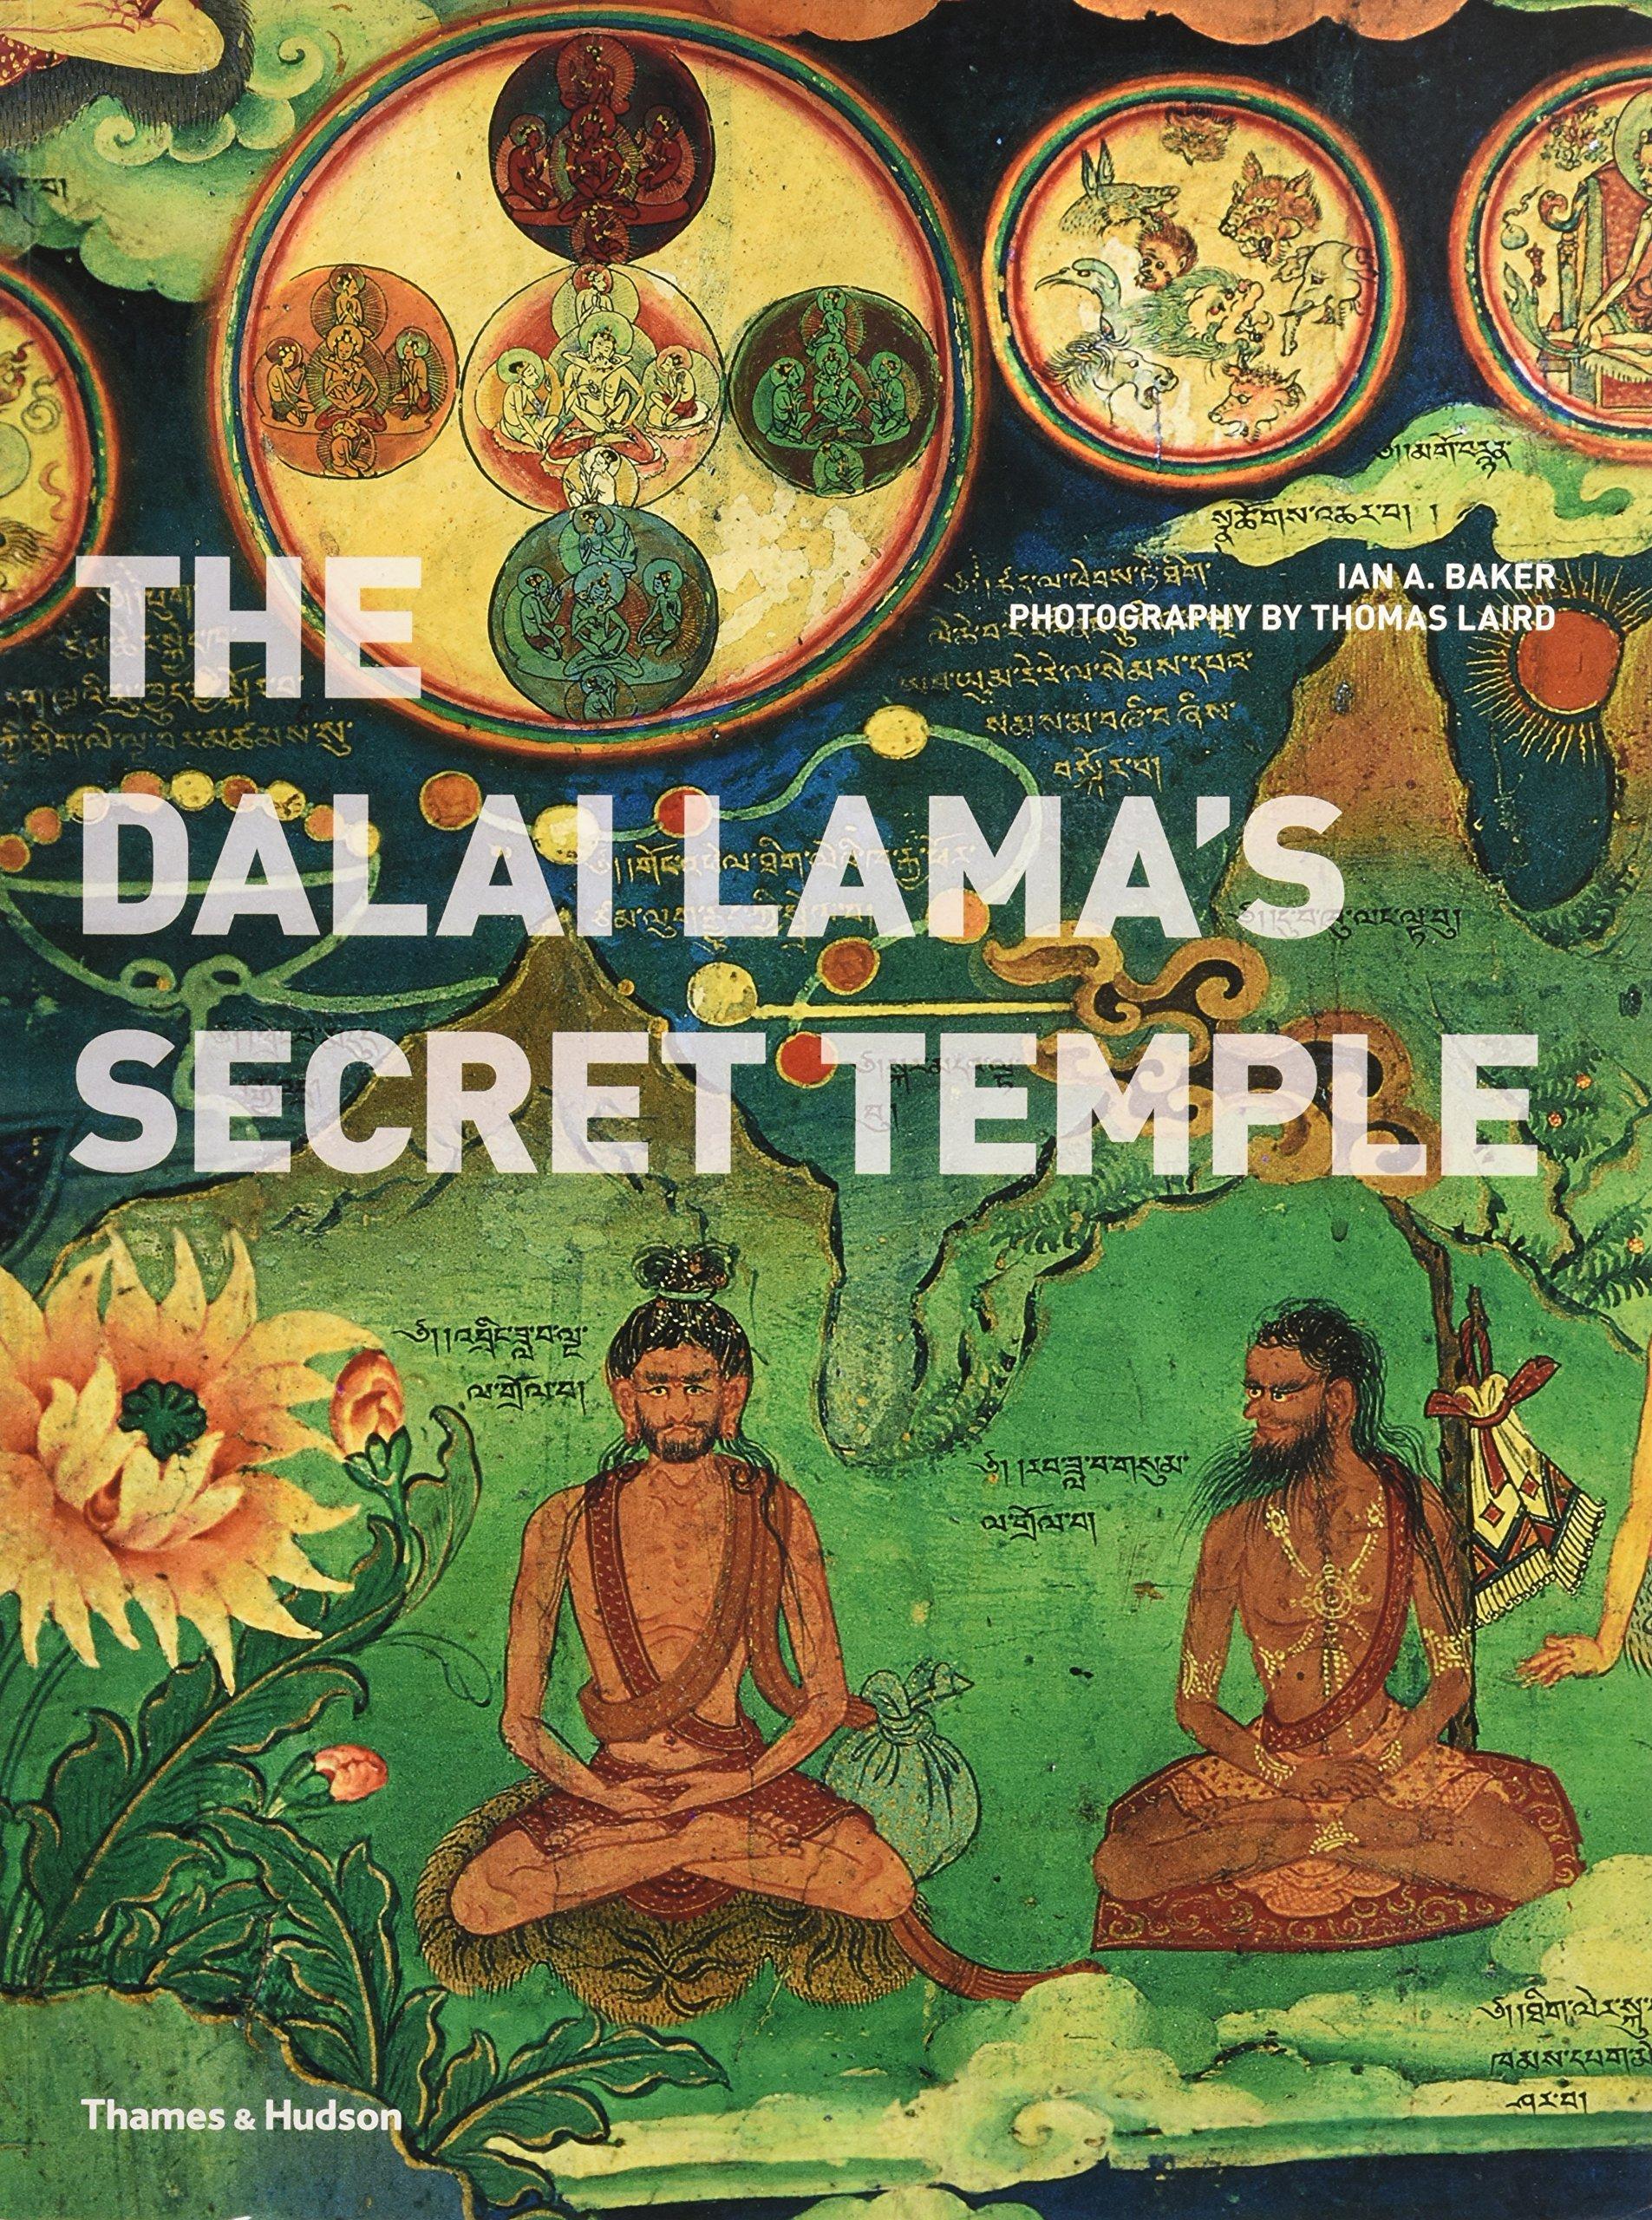 The Dalai Lama's secret temple (Anglais) Broché – 1 septembre 2011 Ian A. Baker Thomas Laird Thames & Hudson Ltd 0500289611